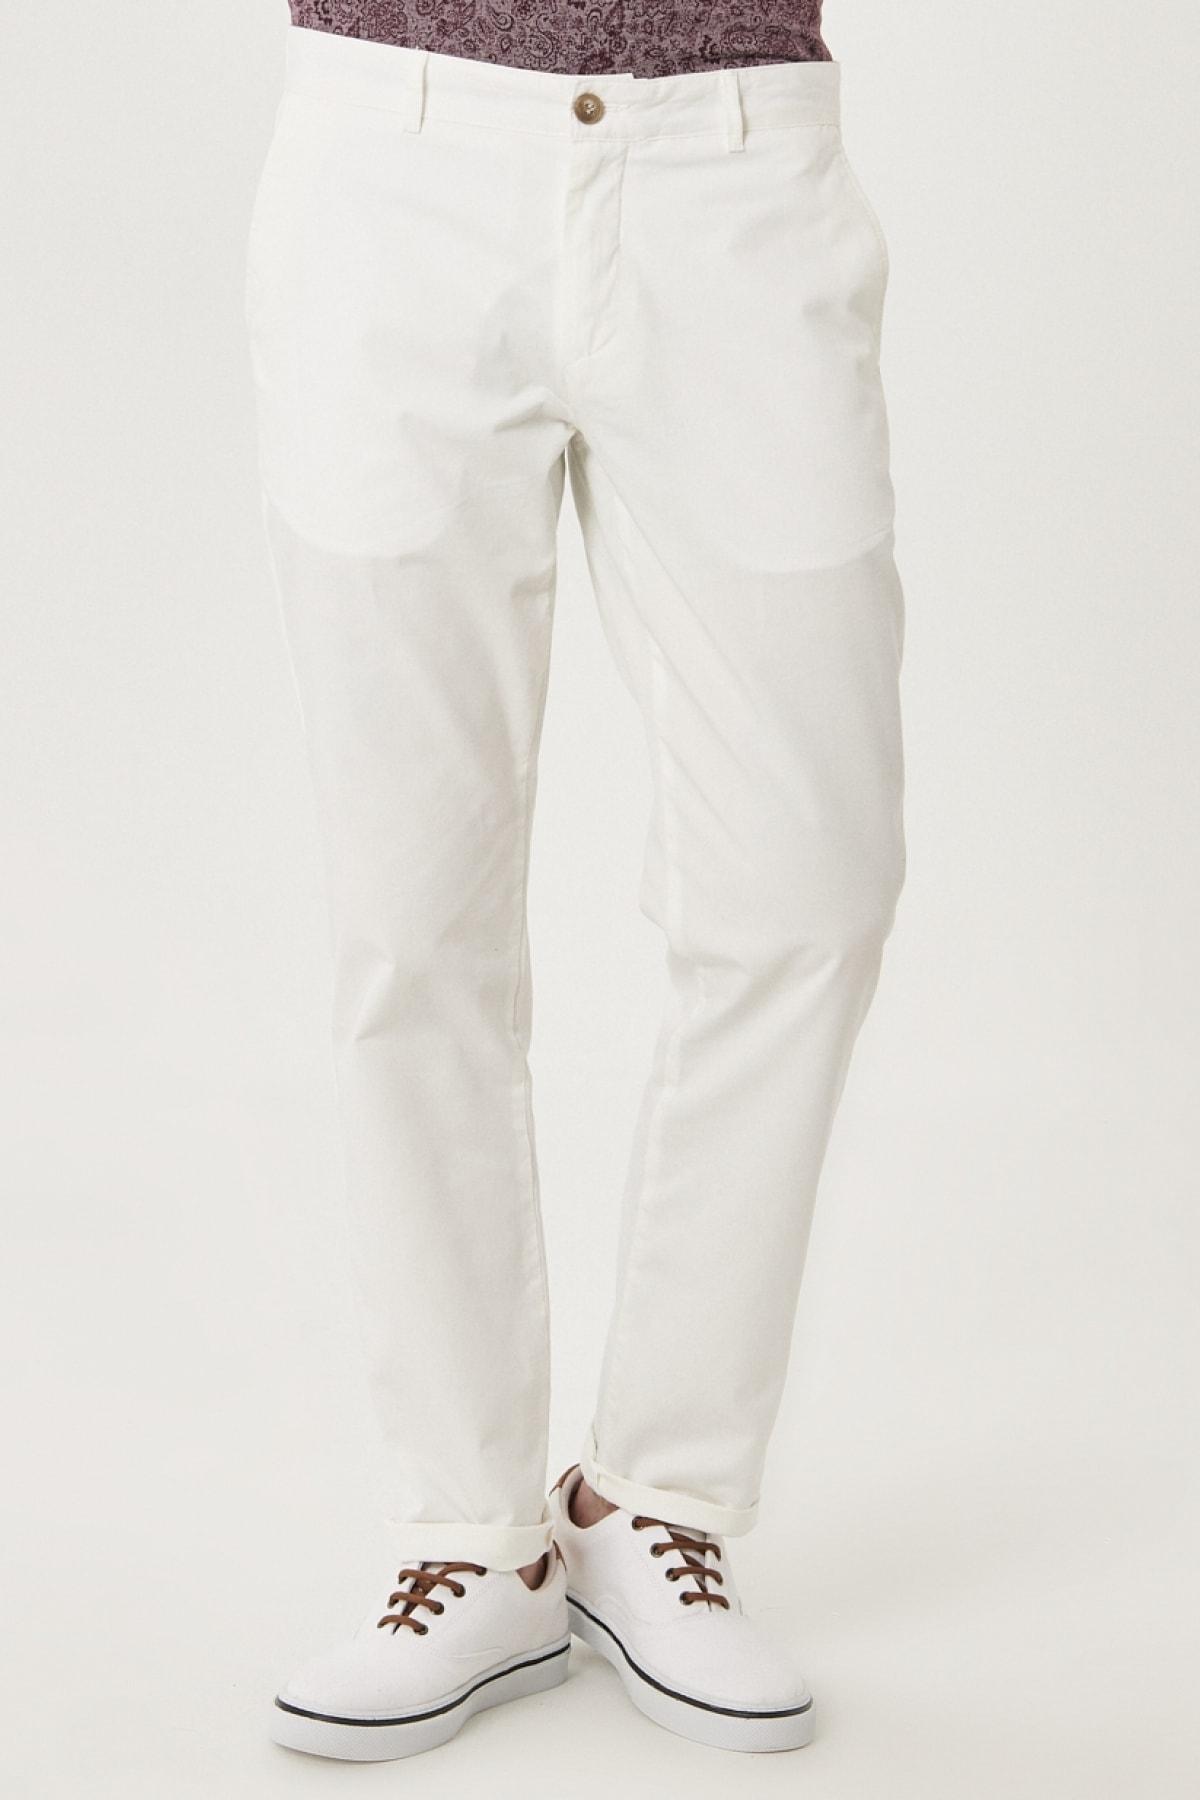 ALTINYILDIZ CLASSICS Erkek Beyaz Kanvas Slim Fit Chino Pantolon 1